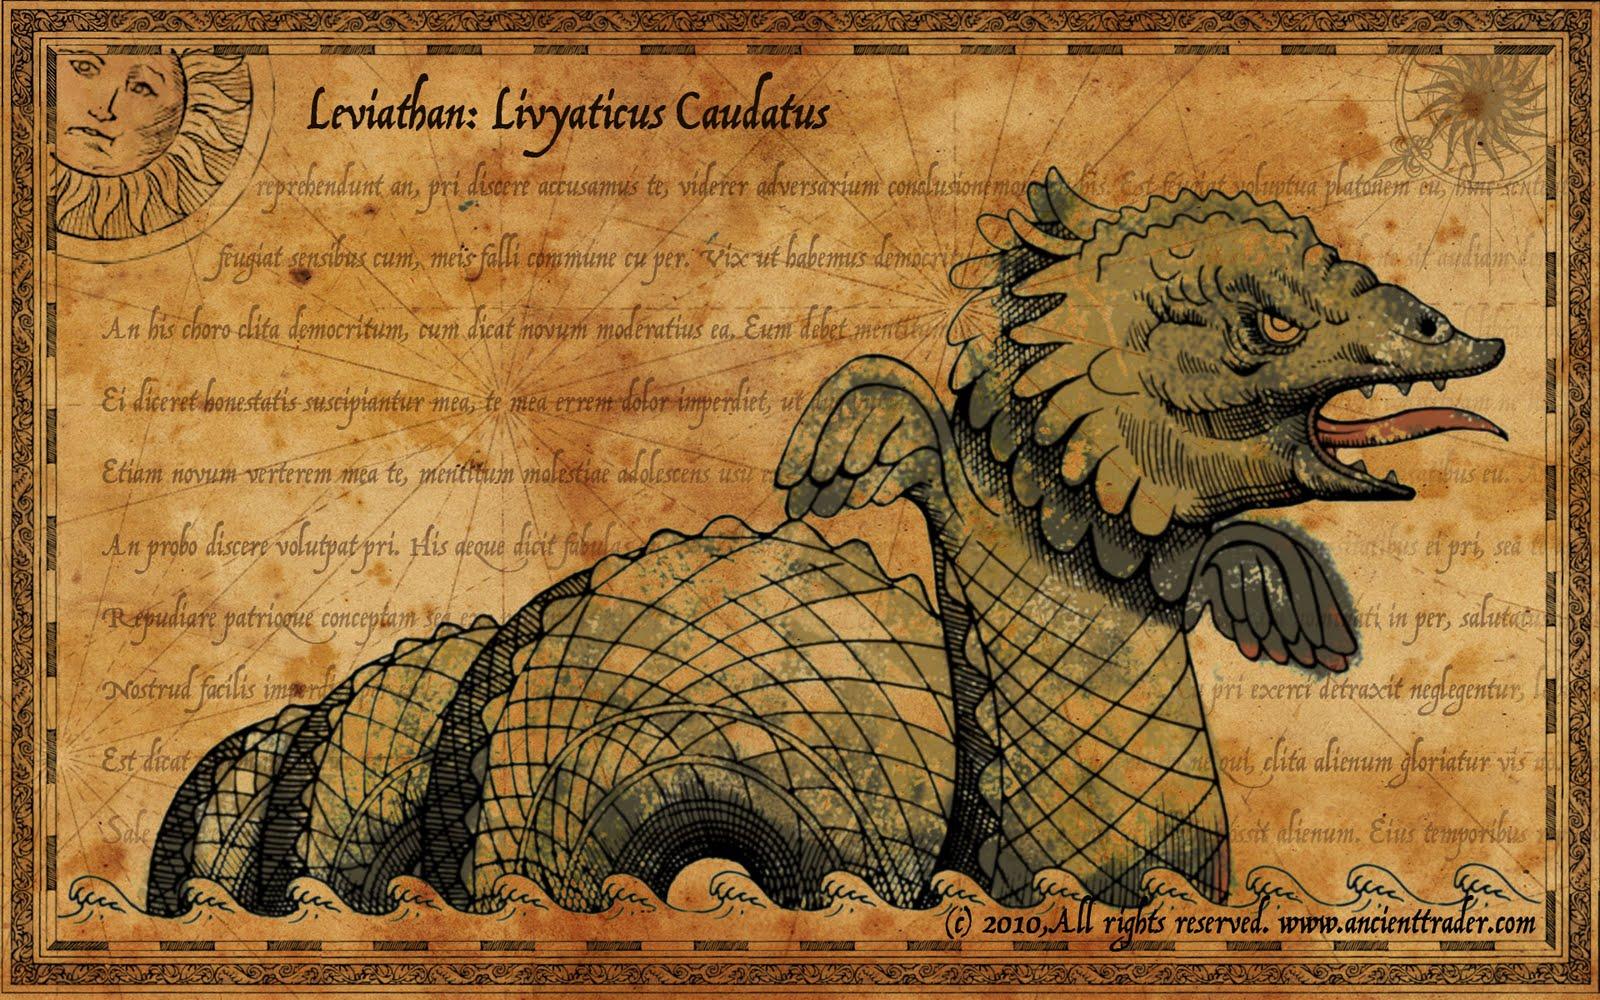 http://2.bp.blogspot.com/_XdP6Lp2ceqY/TGAISenC3yI/AAAAAAAAYYE/cjKjYNuT8j4/s1600/leviathan_wallpaper_1920.jpg